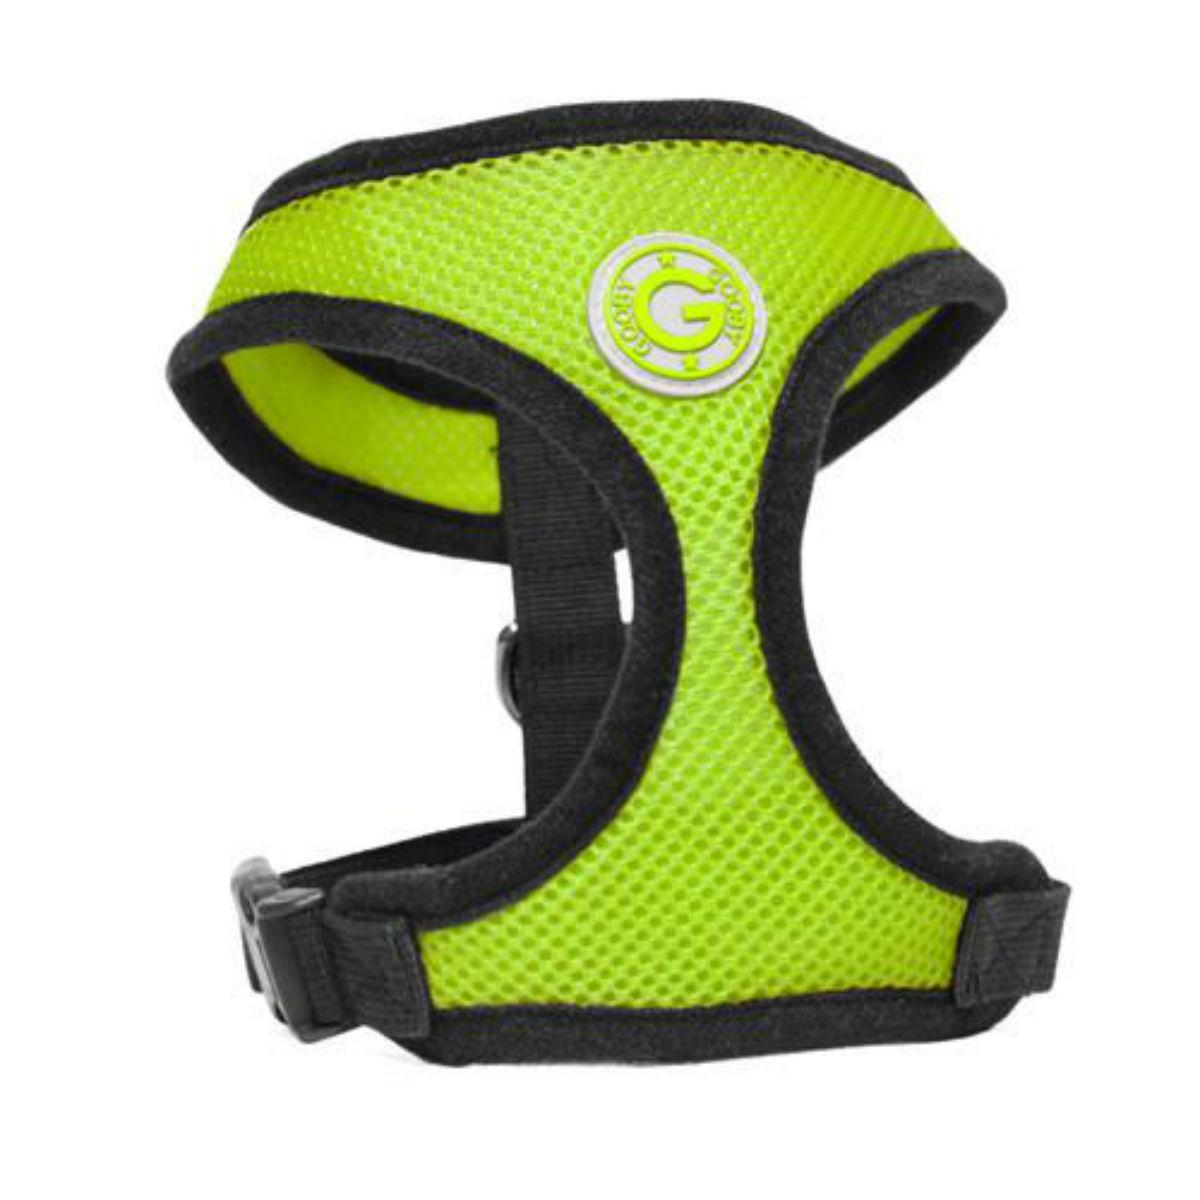 Gooby Soft Mesh Dog Harness - Green